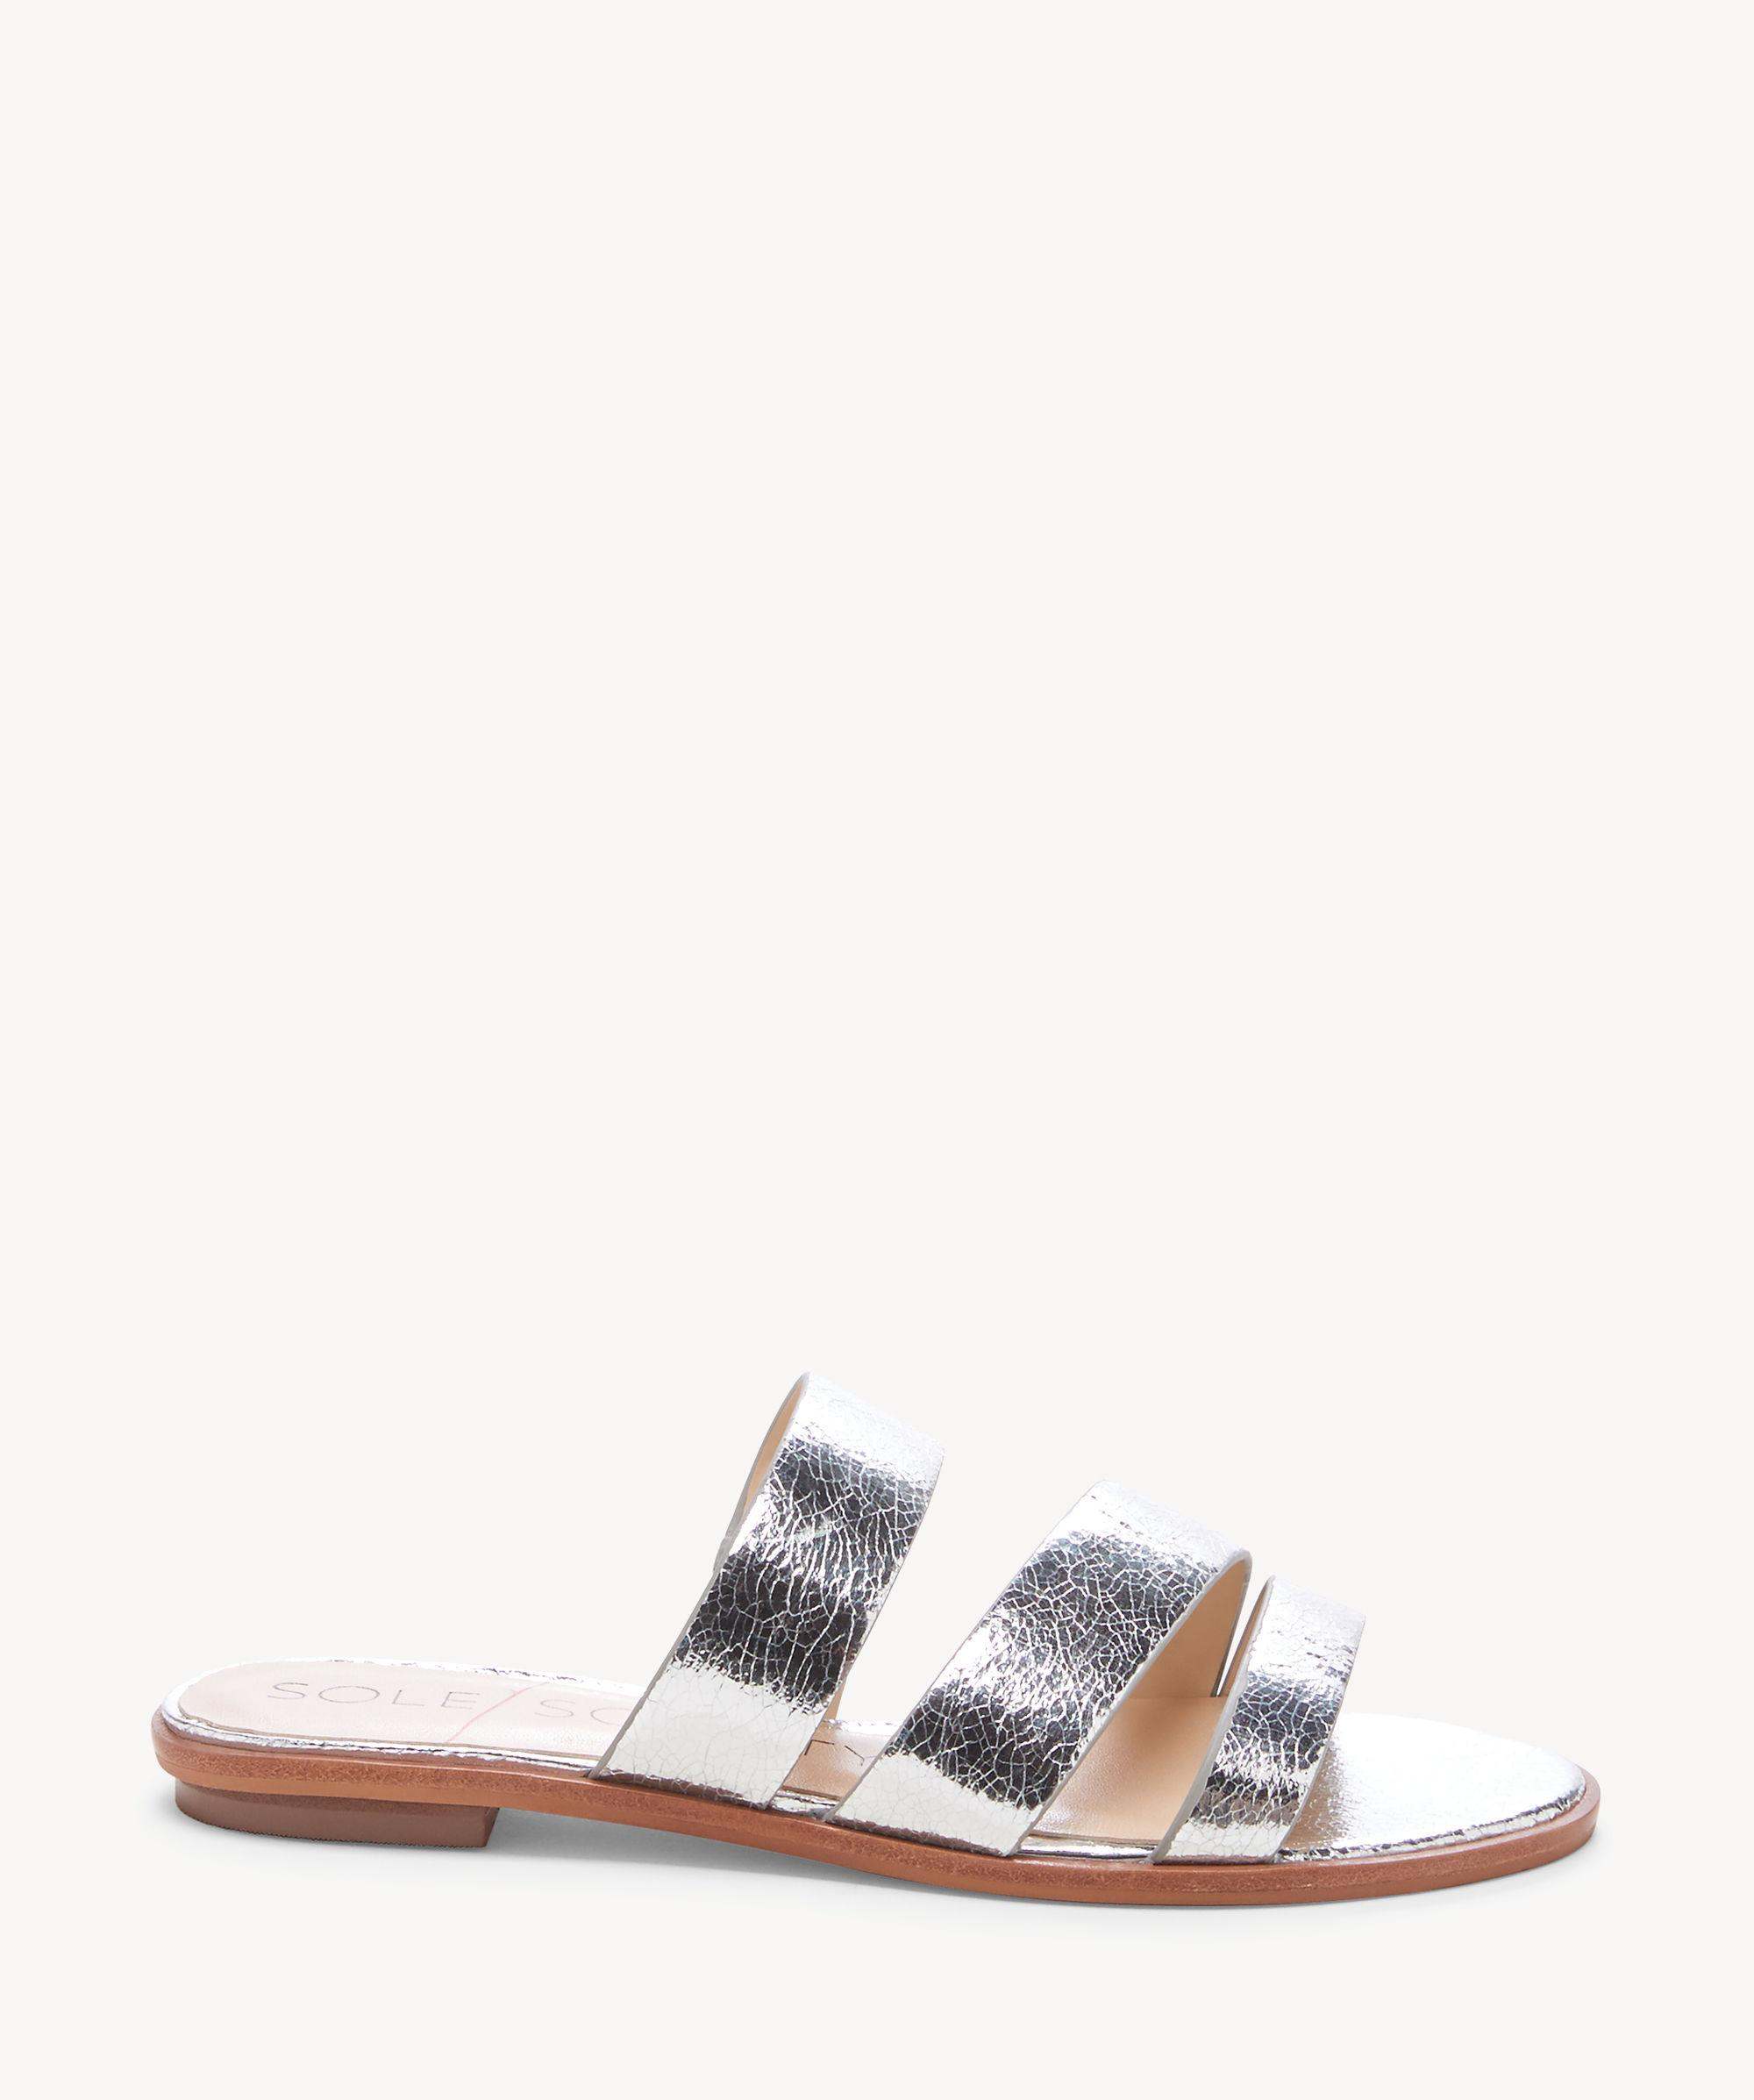 d4e2bc0a1e44 Lyst - Sole Society Simonaa (gleaming Silver) Women s Sandals in ...